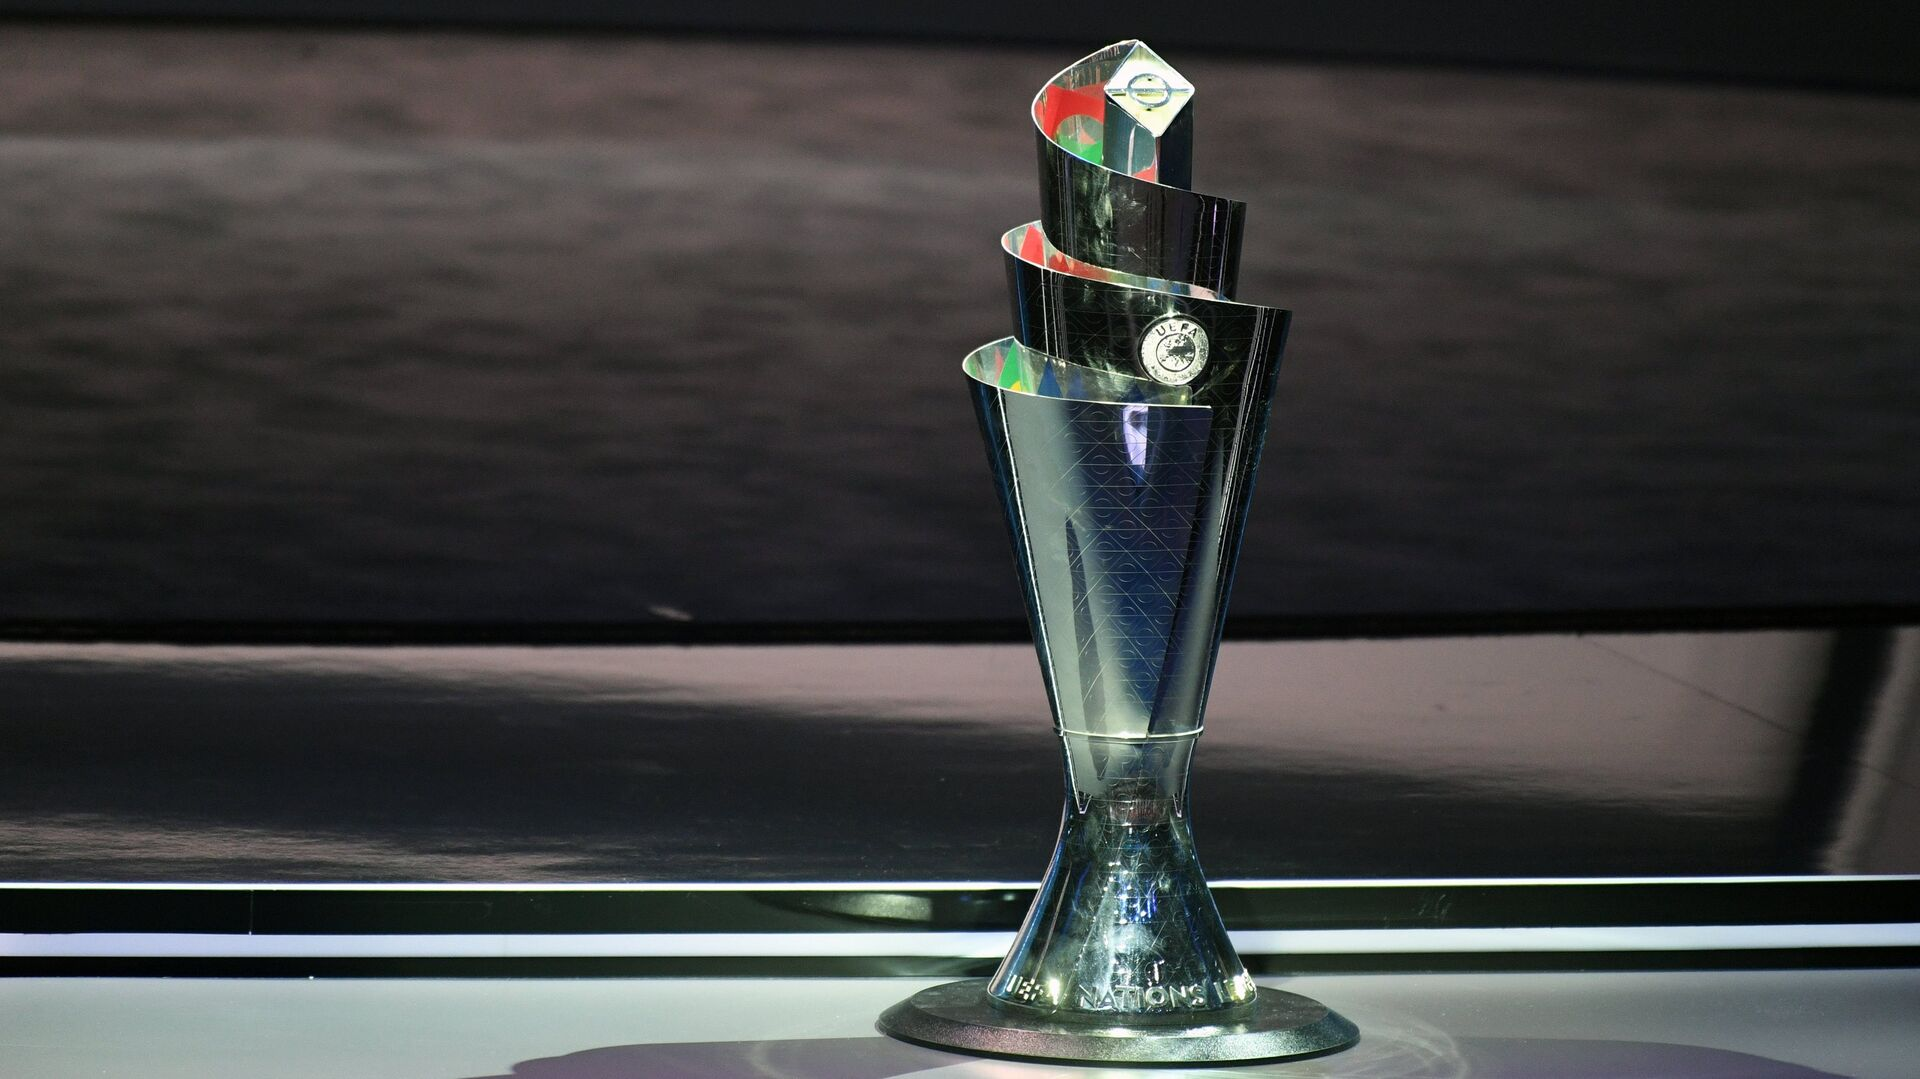 Кубок Лиги наций УЕФА - РИА Новости, 1920, 16.11.2020